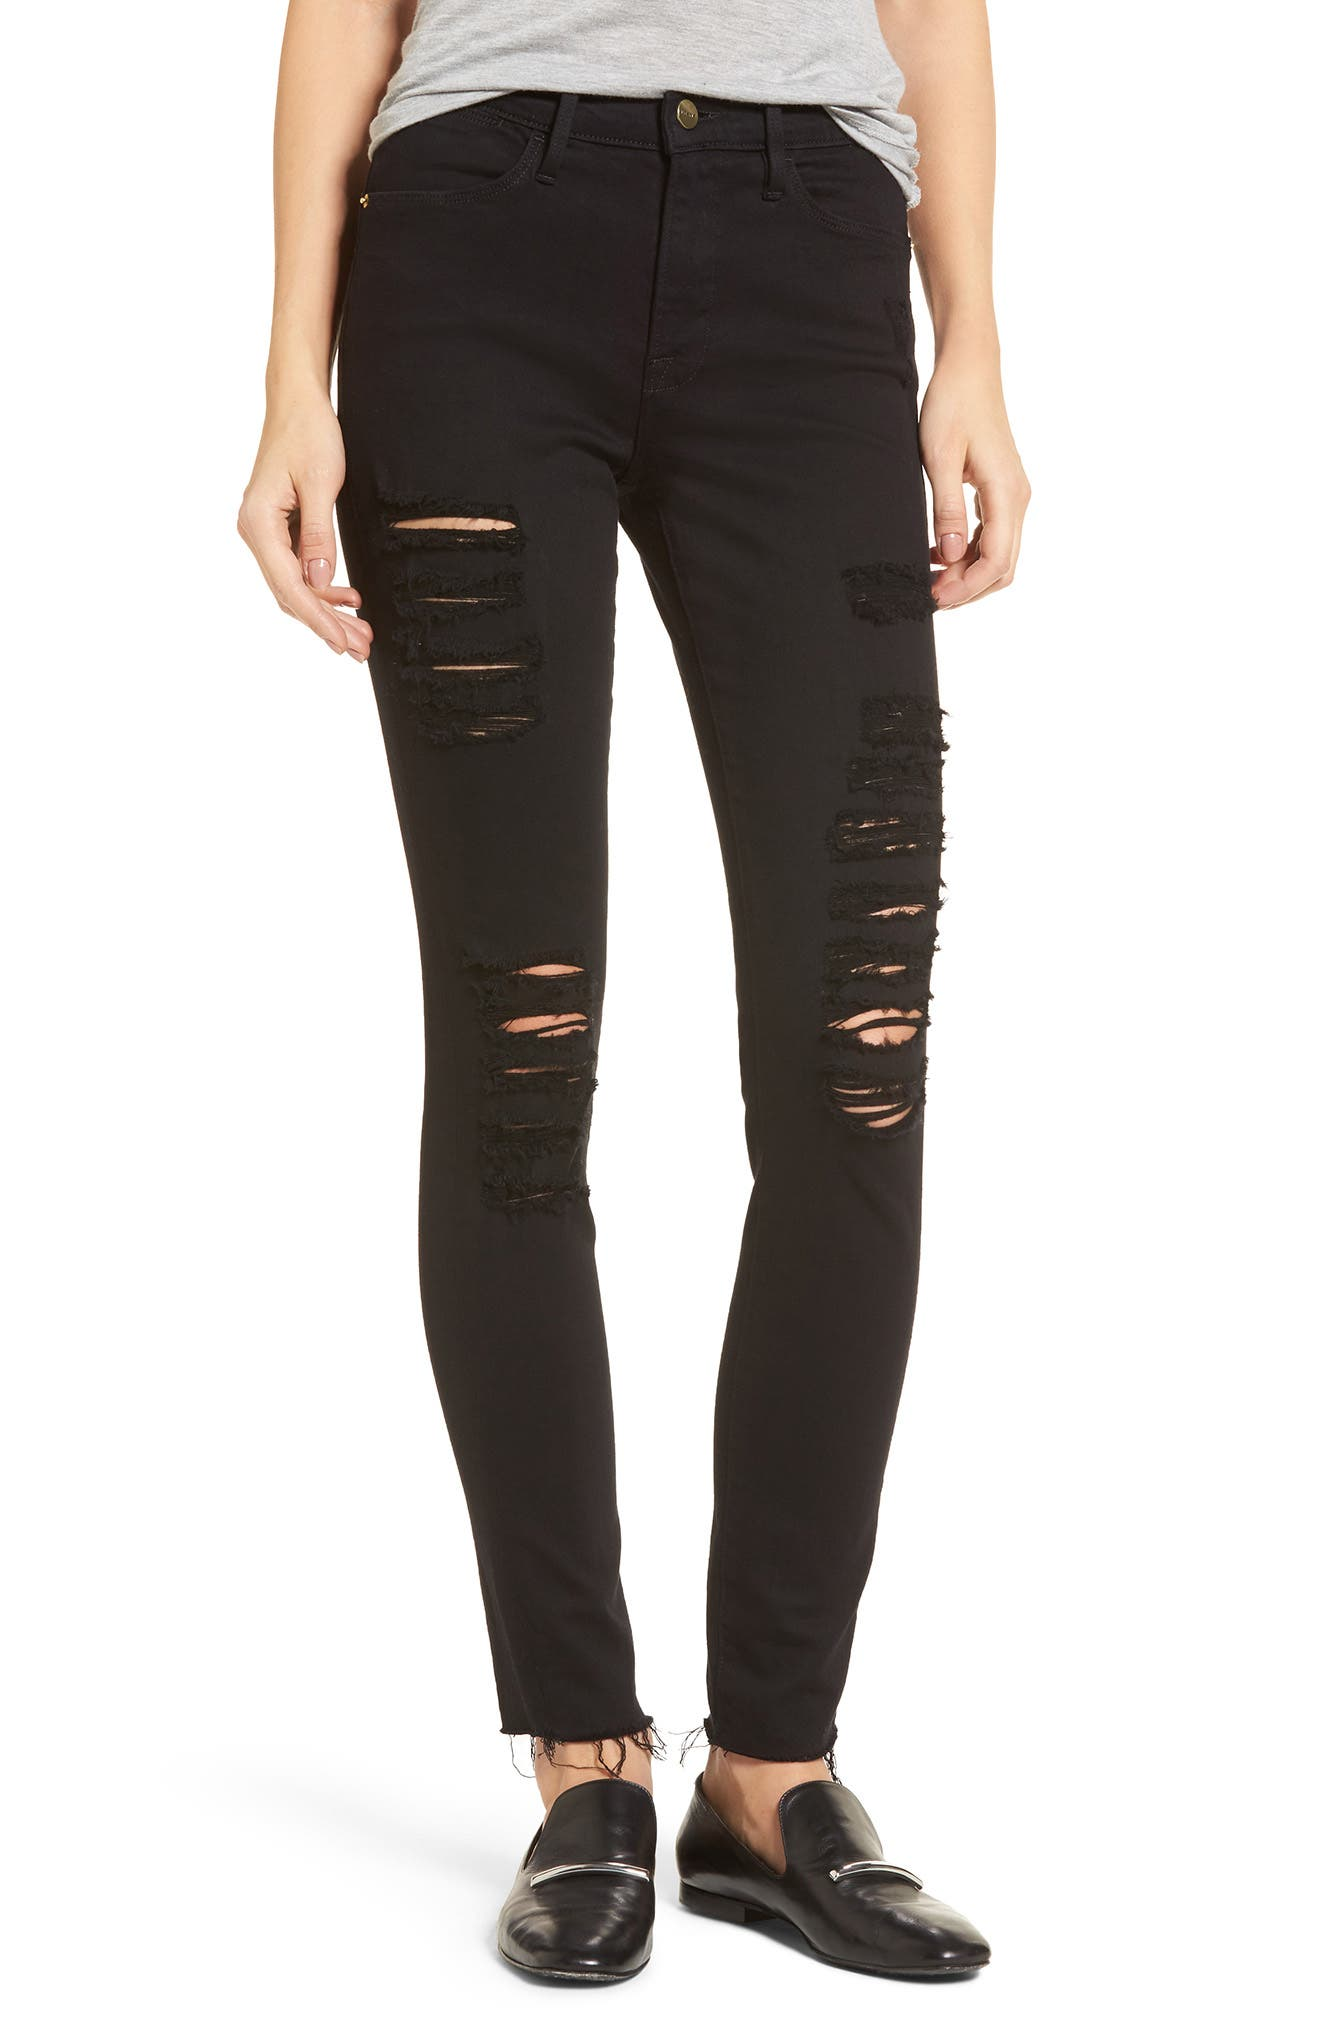 Le Color High Waist Skinny Jeans,                             Main thumbnail 1, color,                             003